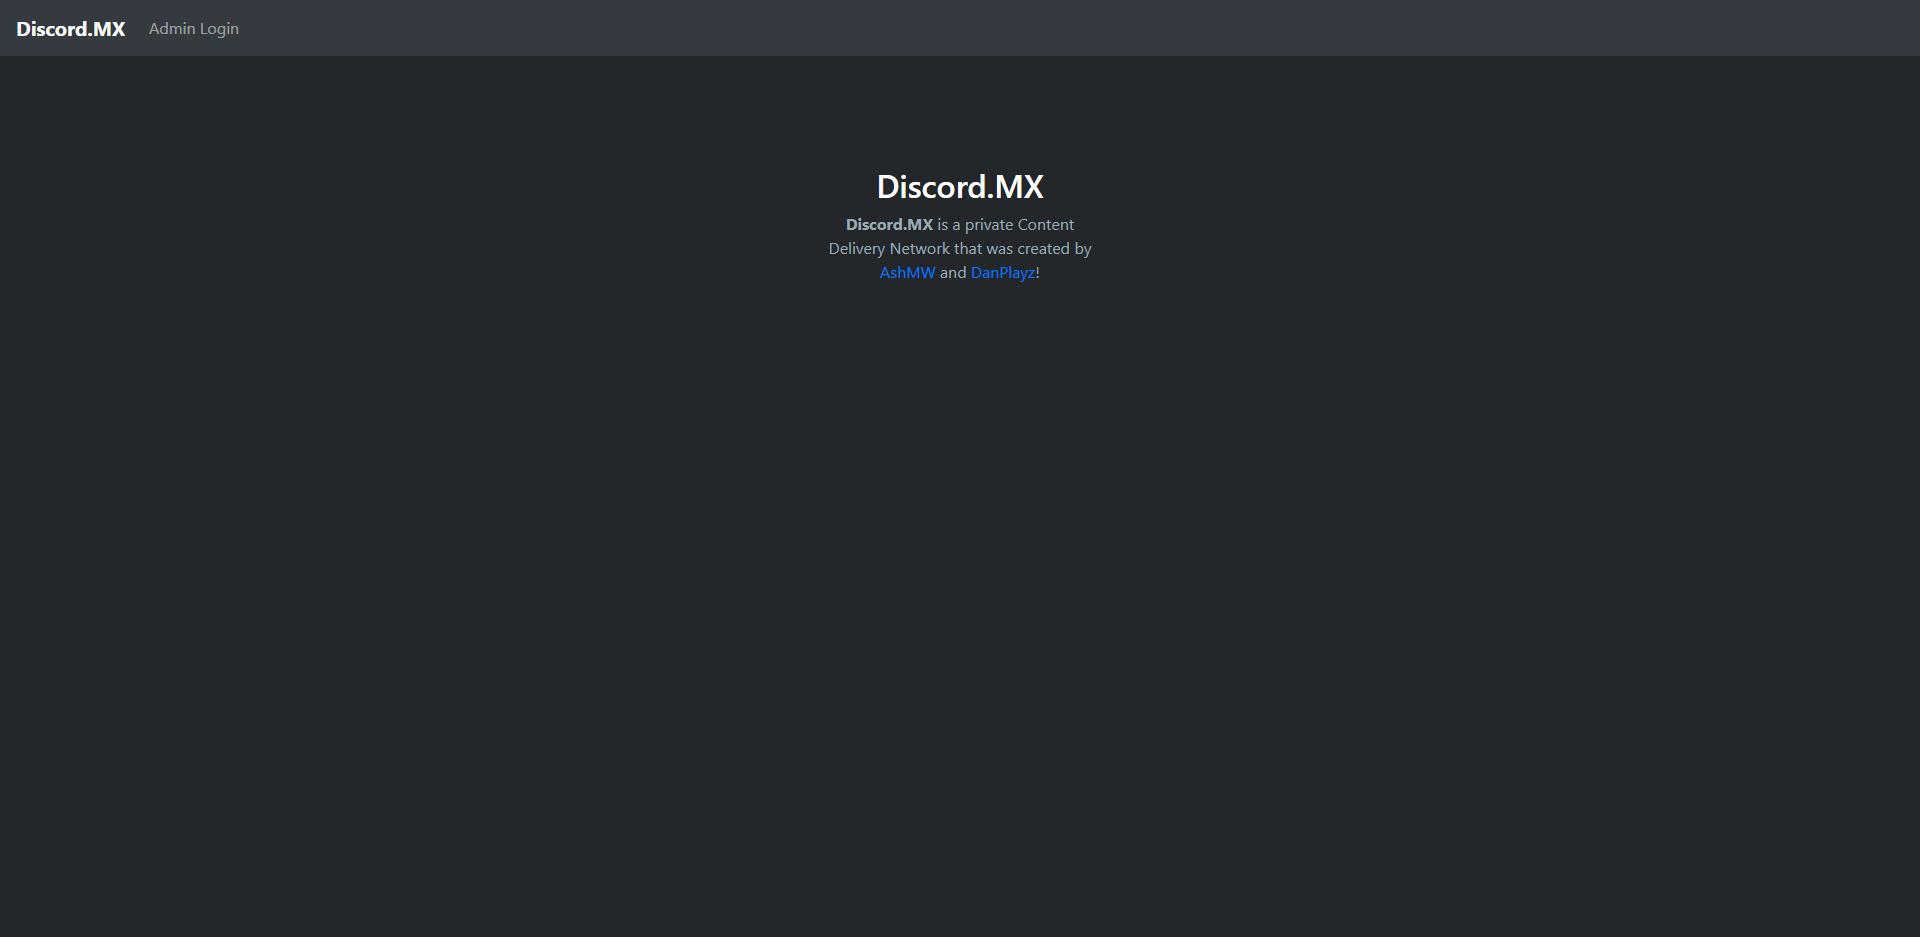 DiscordMX